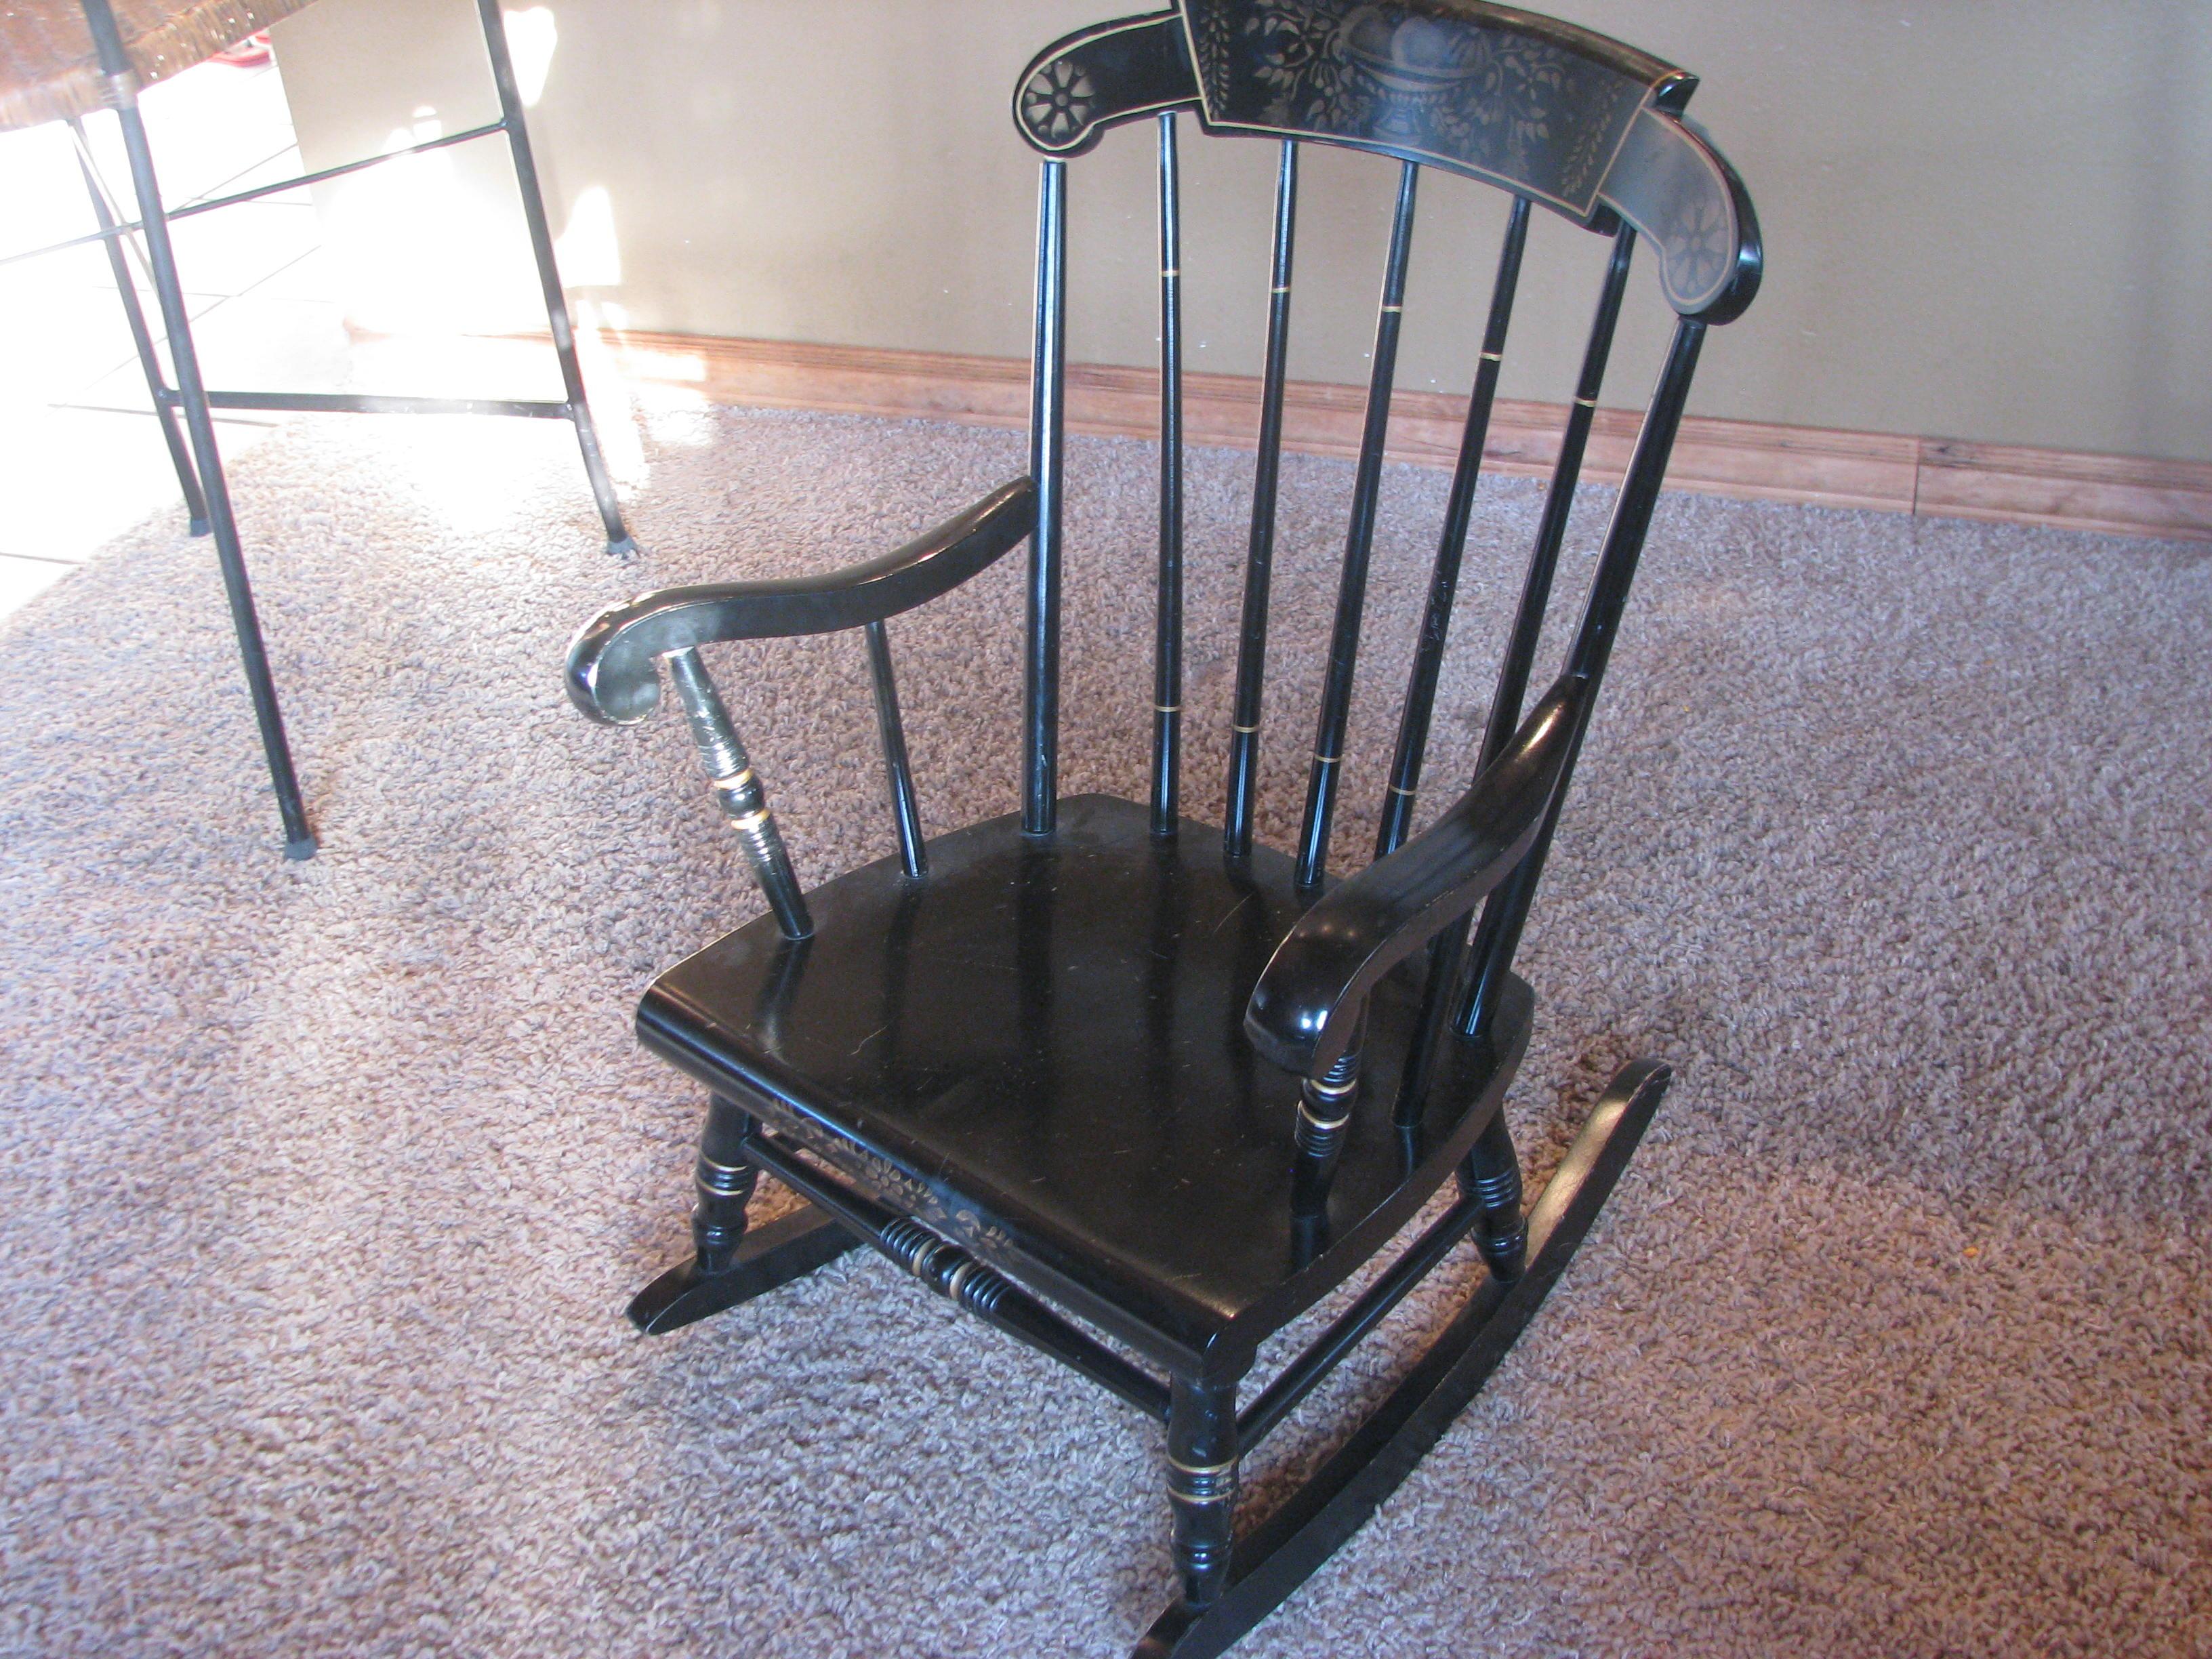 Super Bent And Bros Inc Rocking Chair Gardener Mass 1857 Machost Co Dining Chair Design Ideas Machostcouk